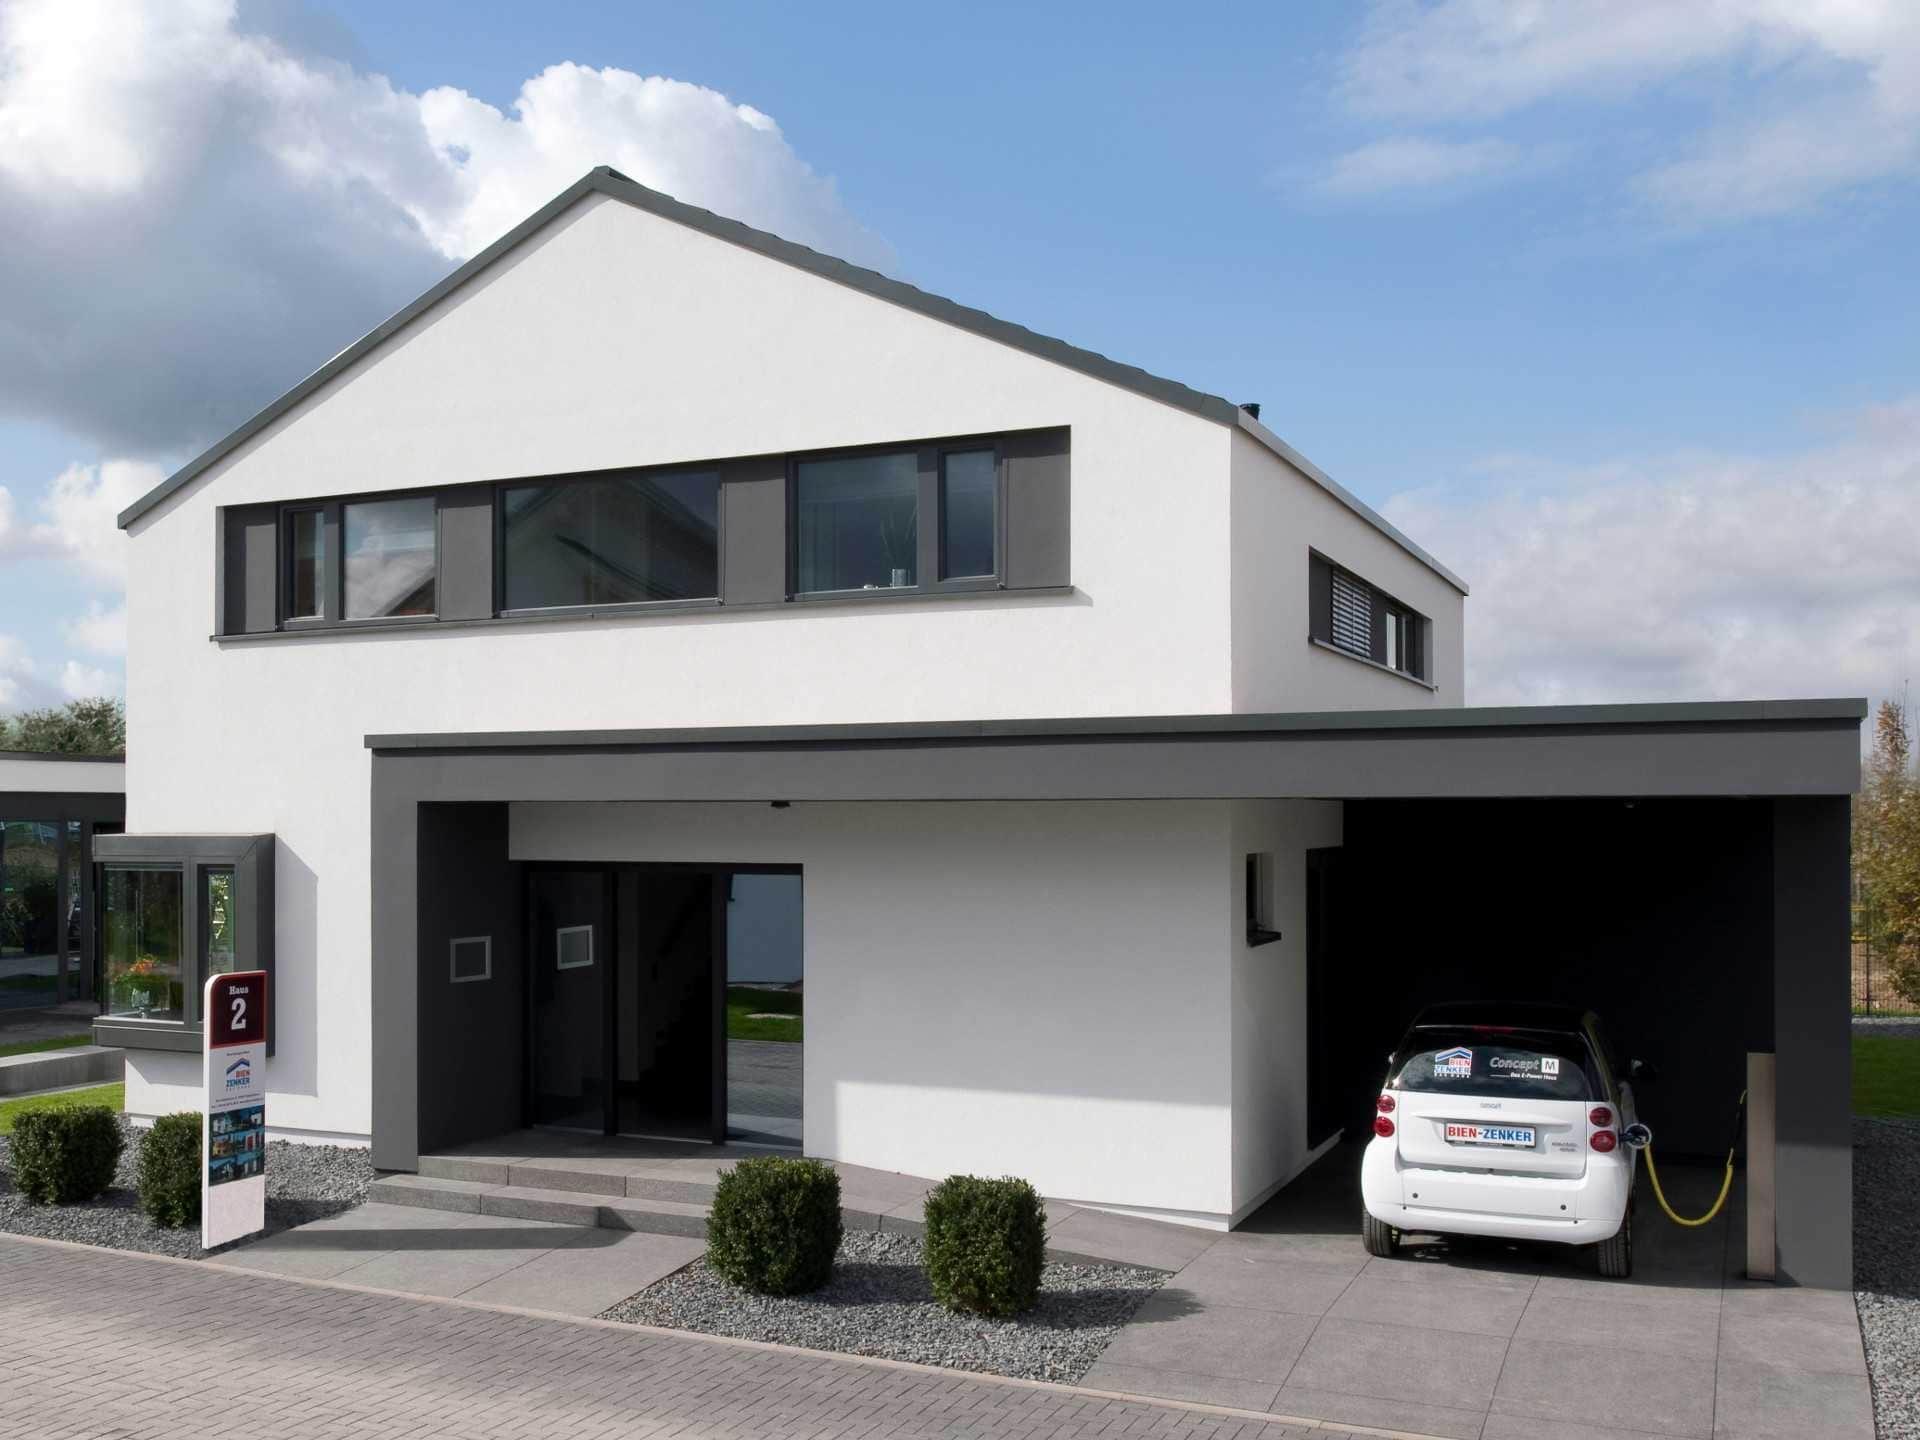 Carport Köln concept m köln design architektenhaus bien zenker contemporary